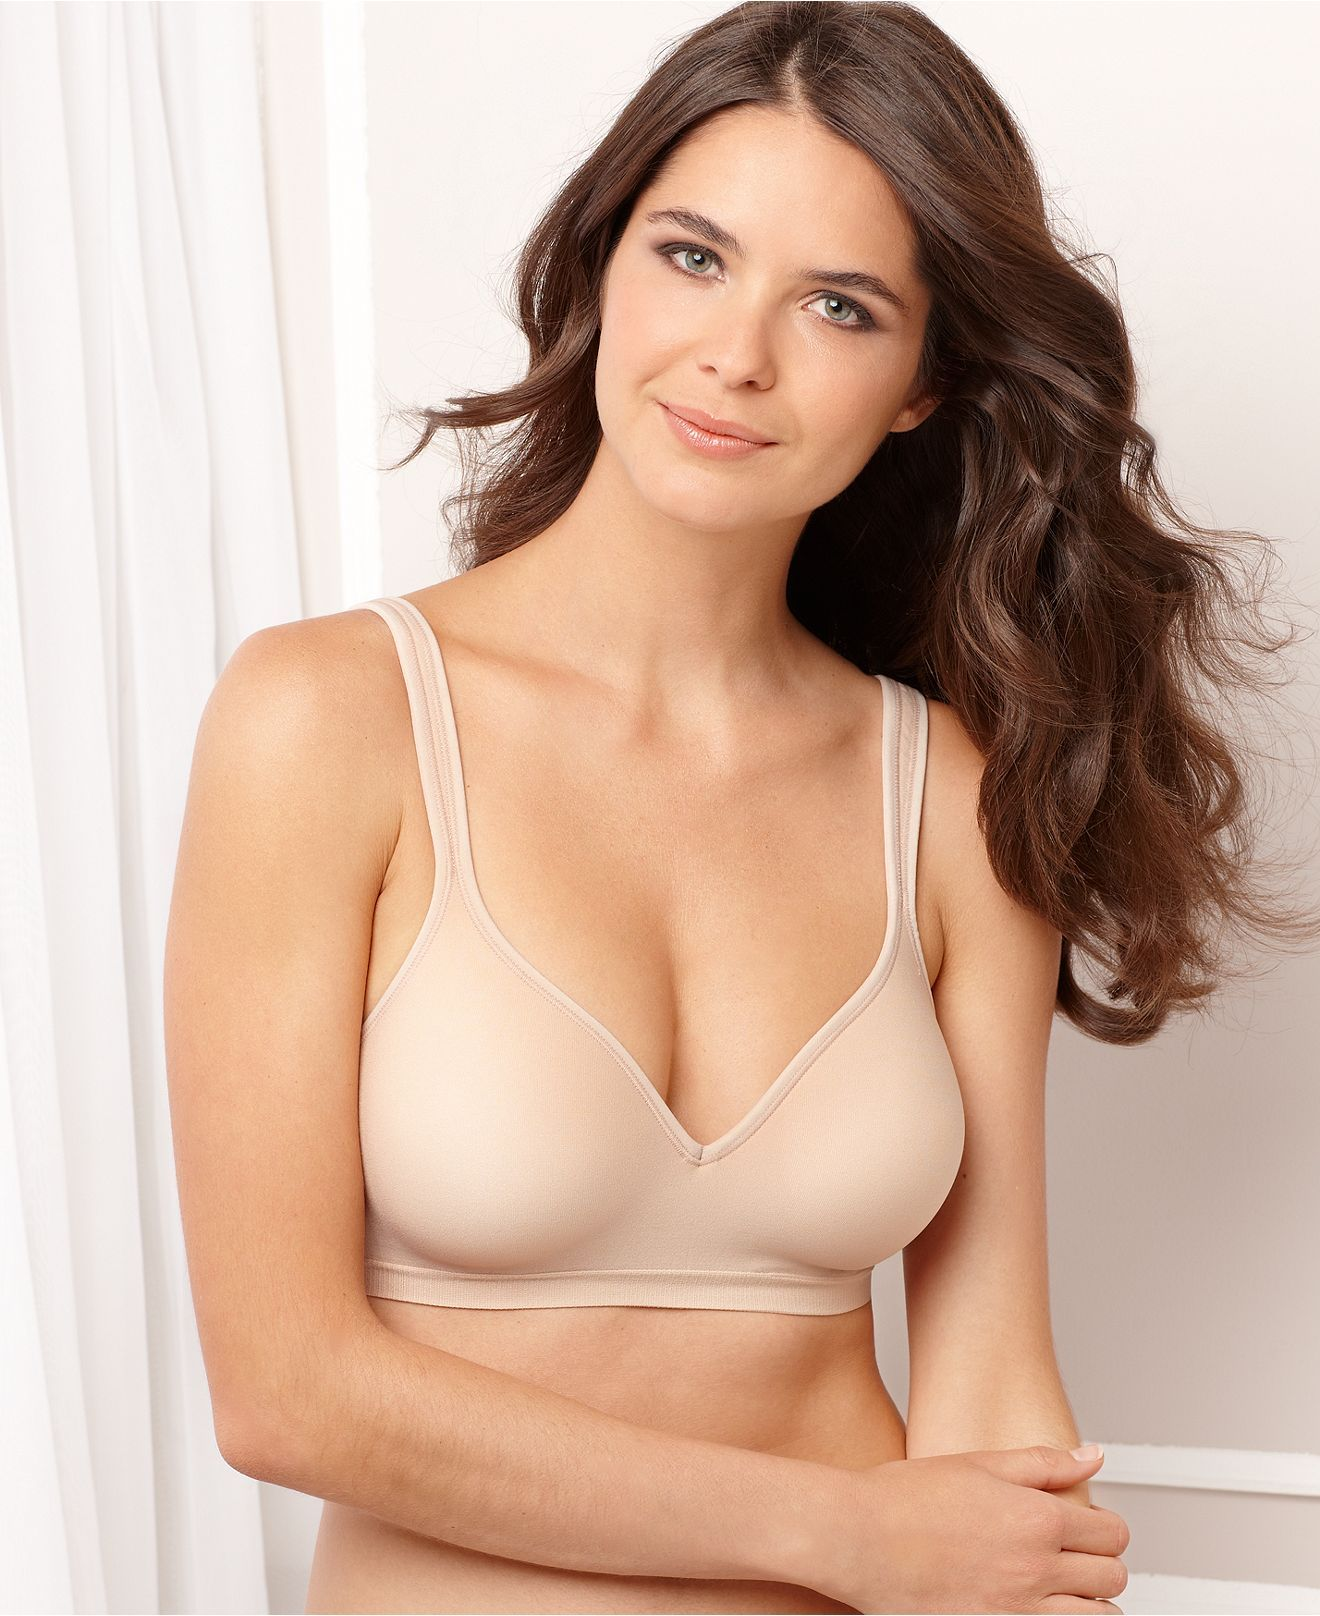 Bali Comfort Revolution Wireless Bra 3463 | Plus size bra, Women's ...